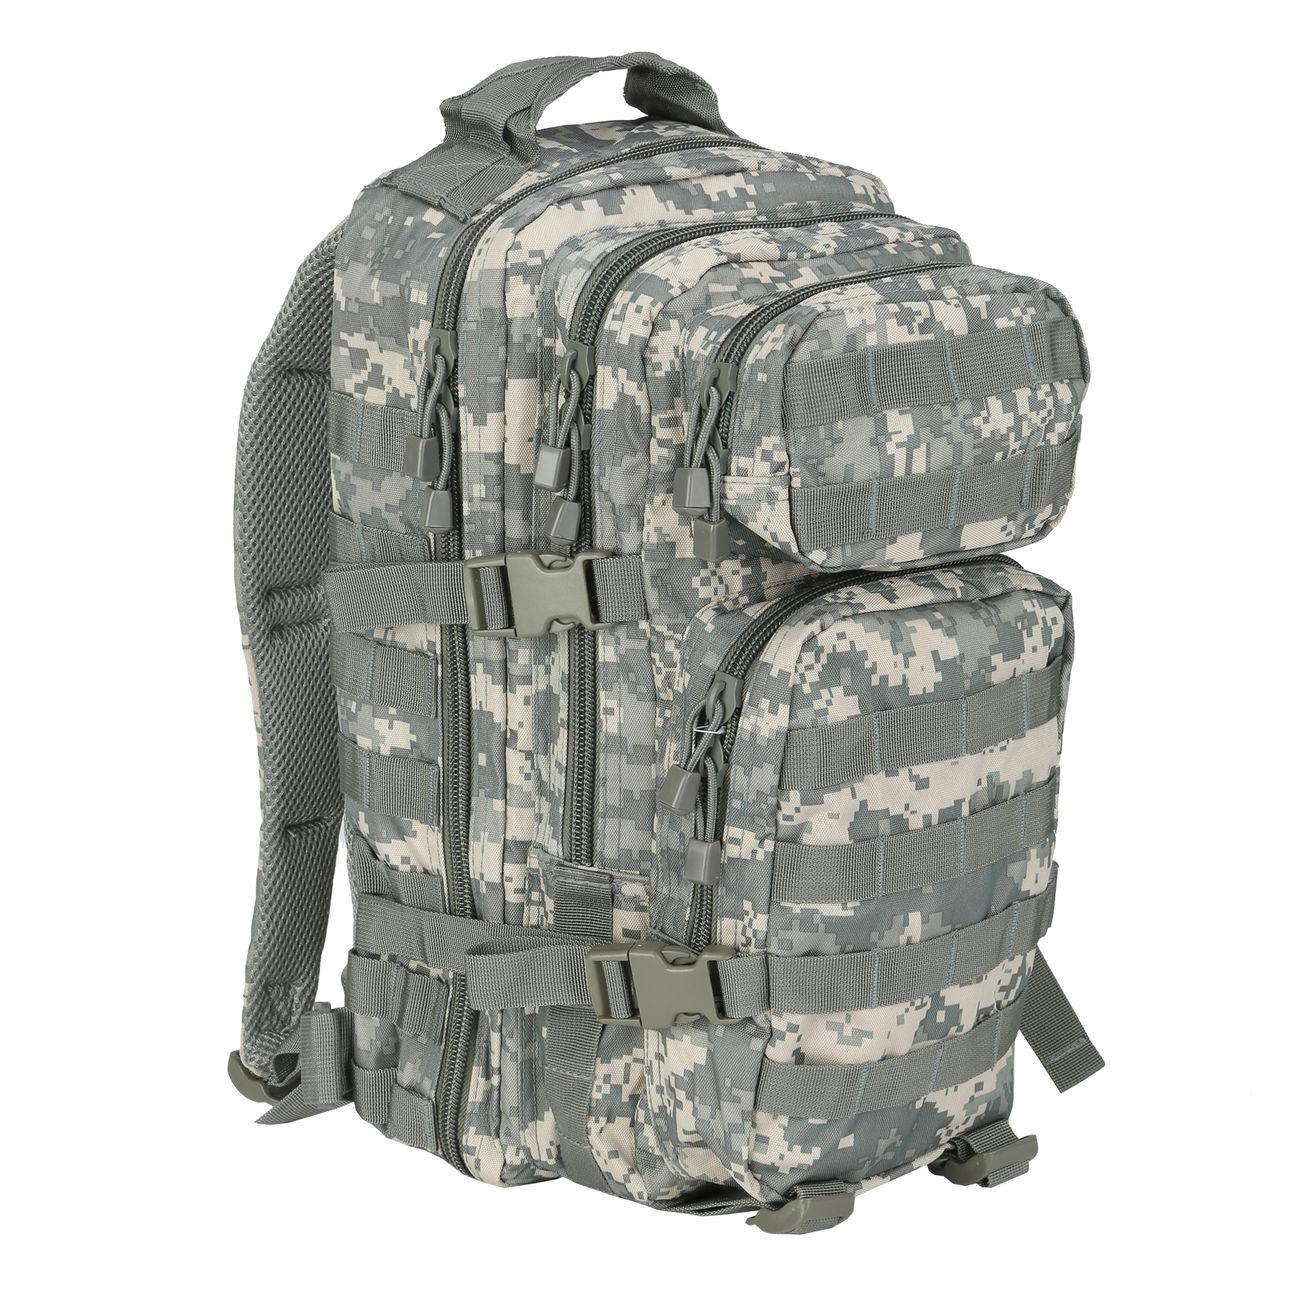 1f5826ad2b02d Mil-Tec Rucksack US Assault Pack I 20 Liter at-digital günstig ...